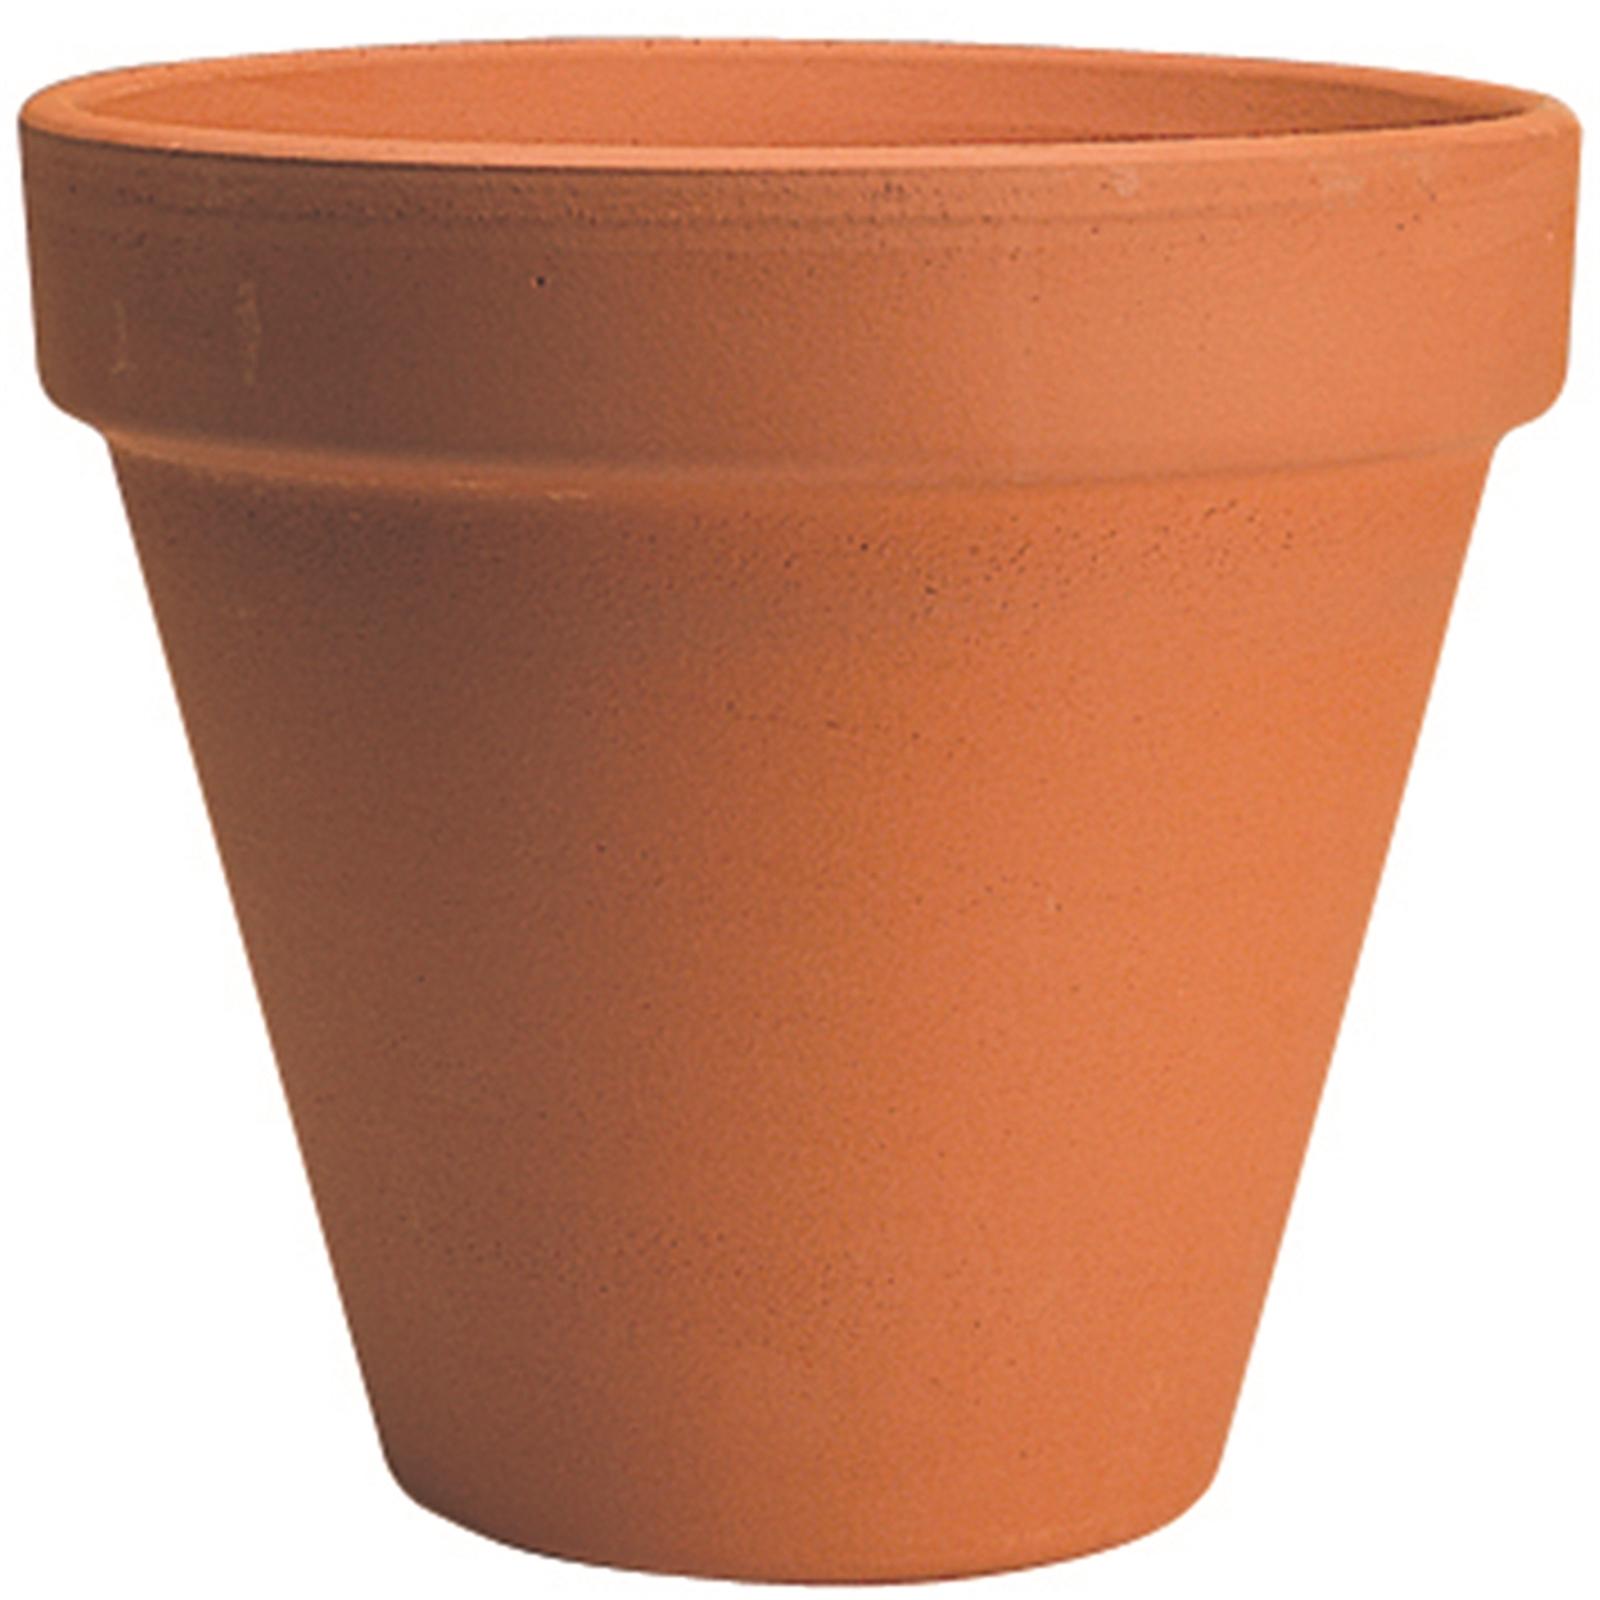 Northcote Pottery 12cm Terracotta Italian Pot